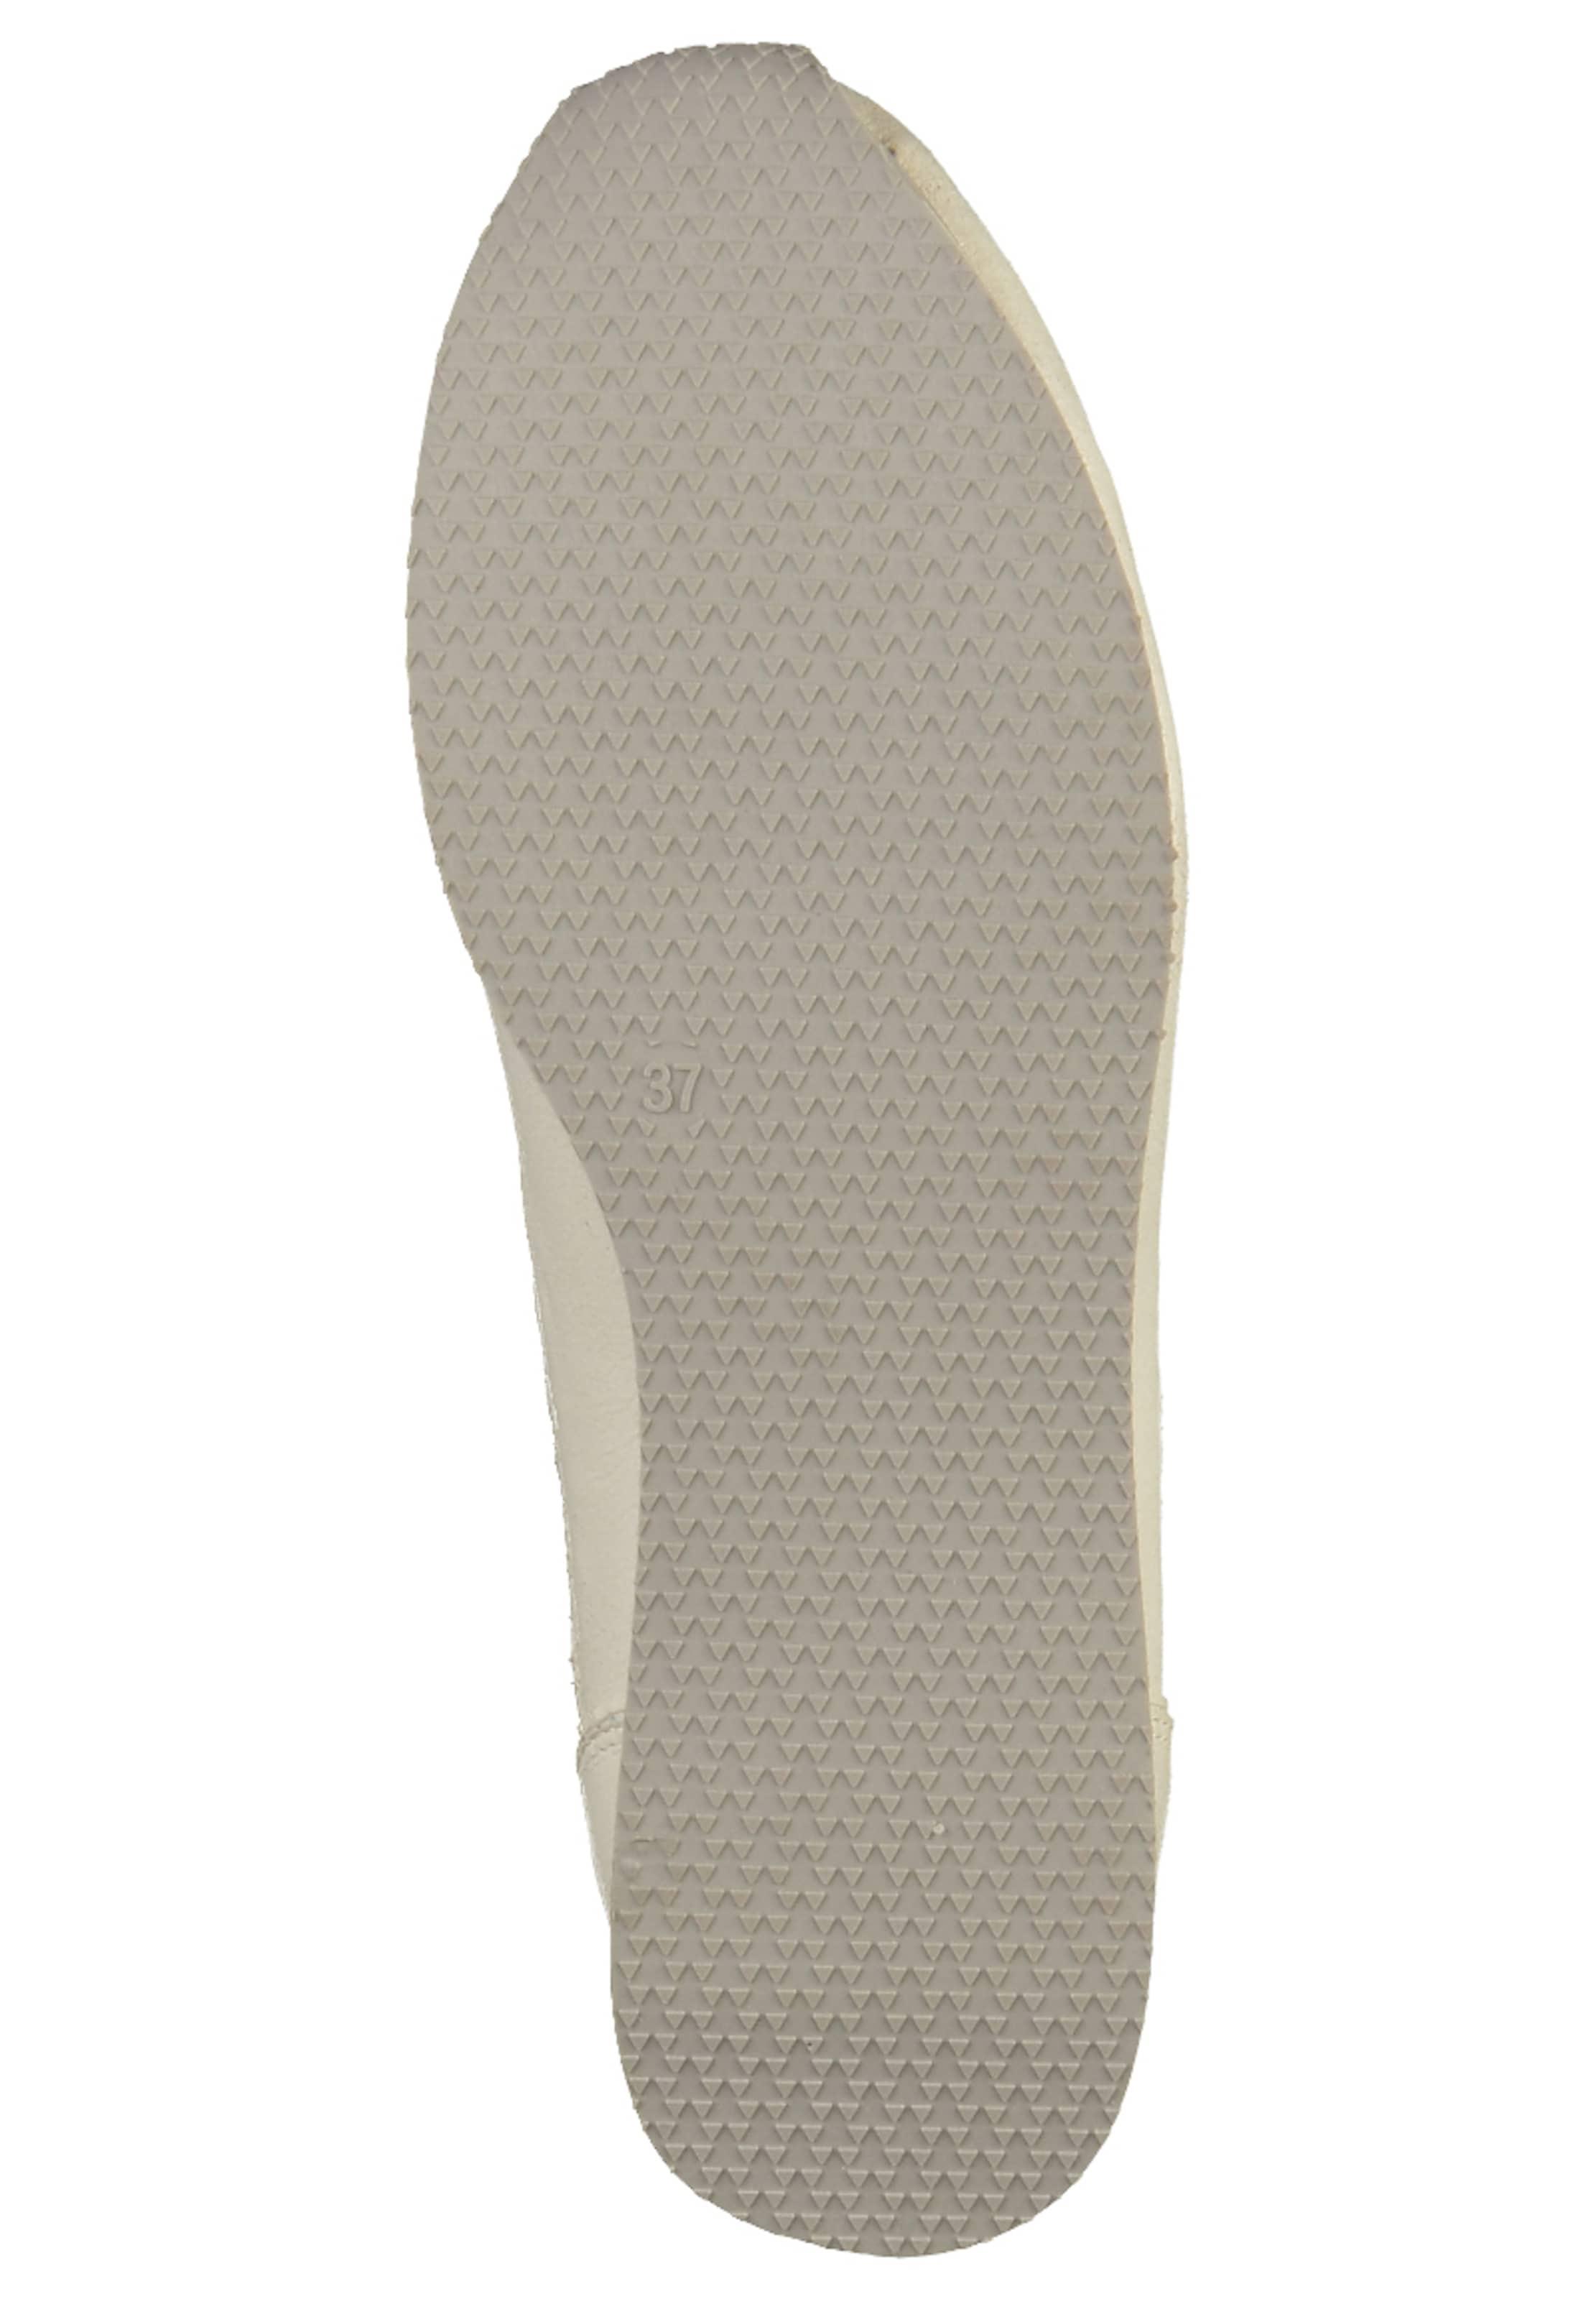 CAPRICE CAPRICE CAPRICE Turnschuhe Leder, Textil Wilde Freizeitschuhe 05407d